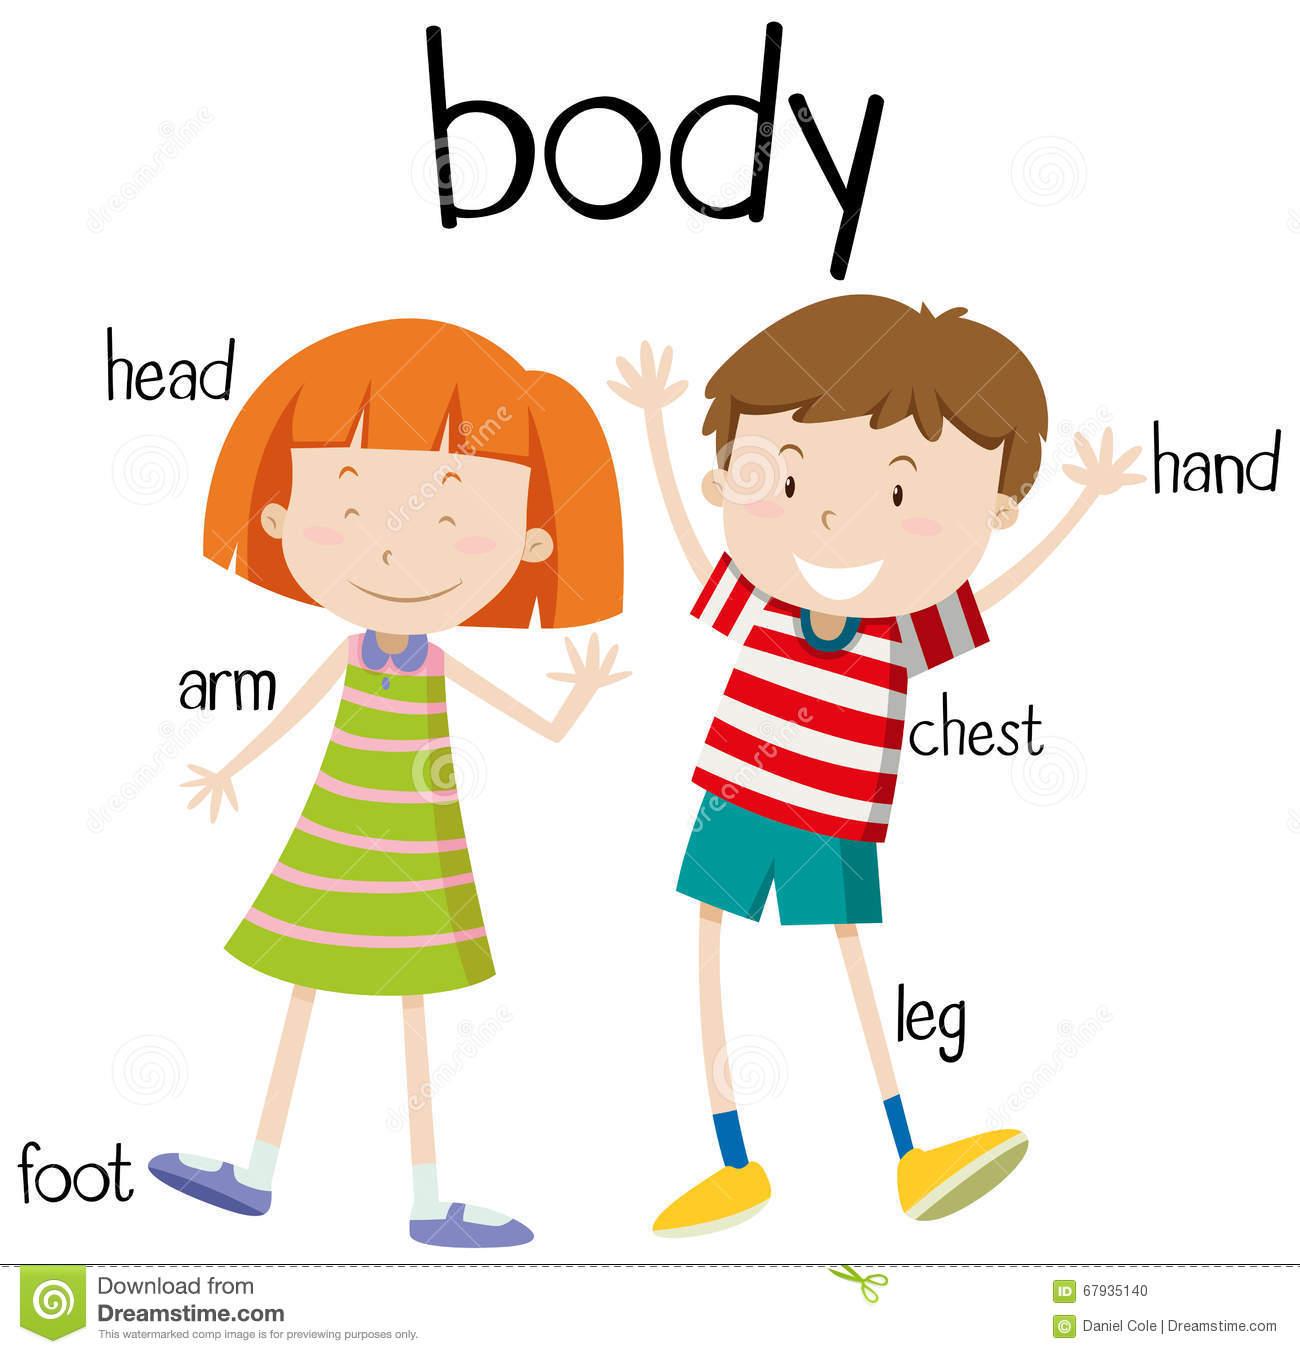 Feet clipart body part Human Body Basic Diagram Parts